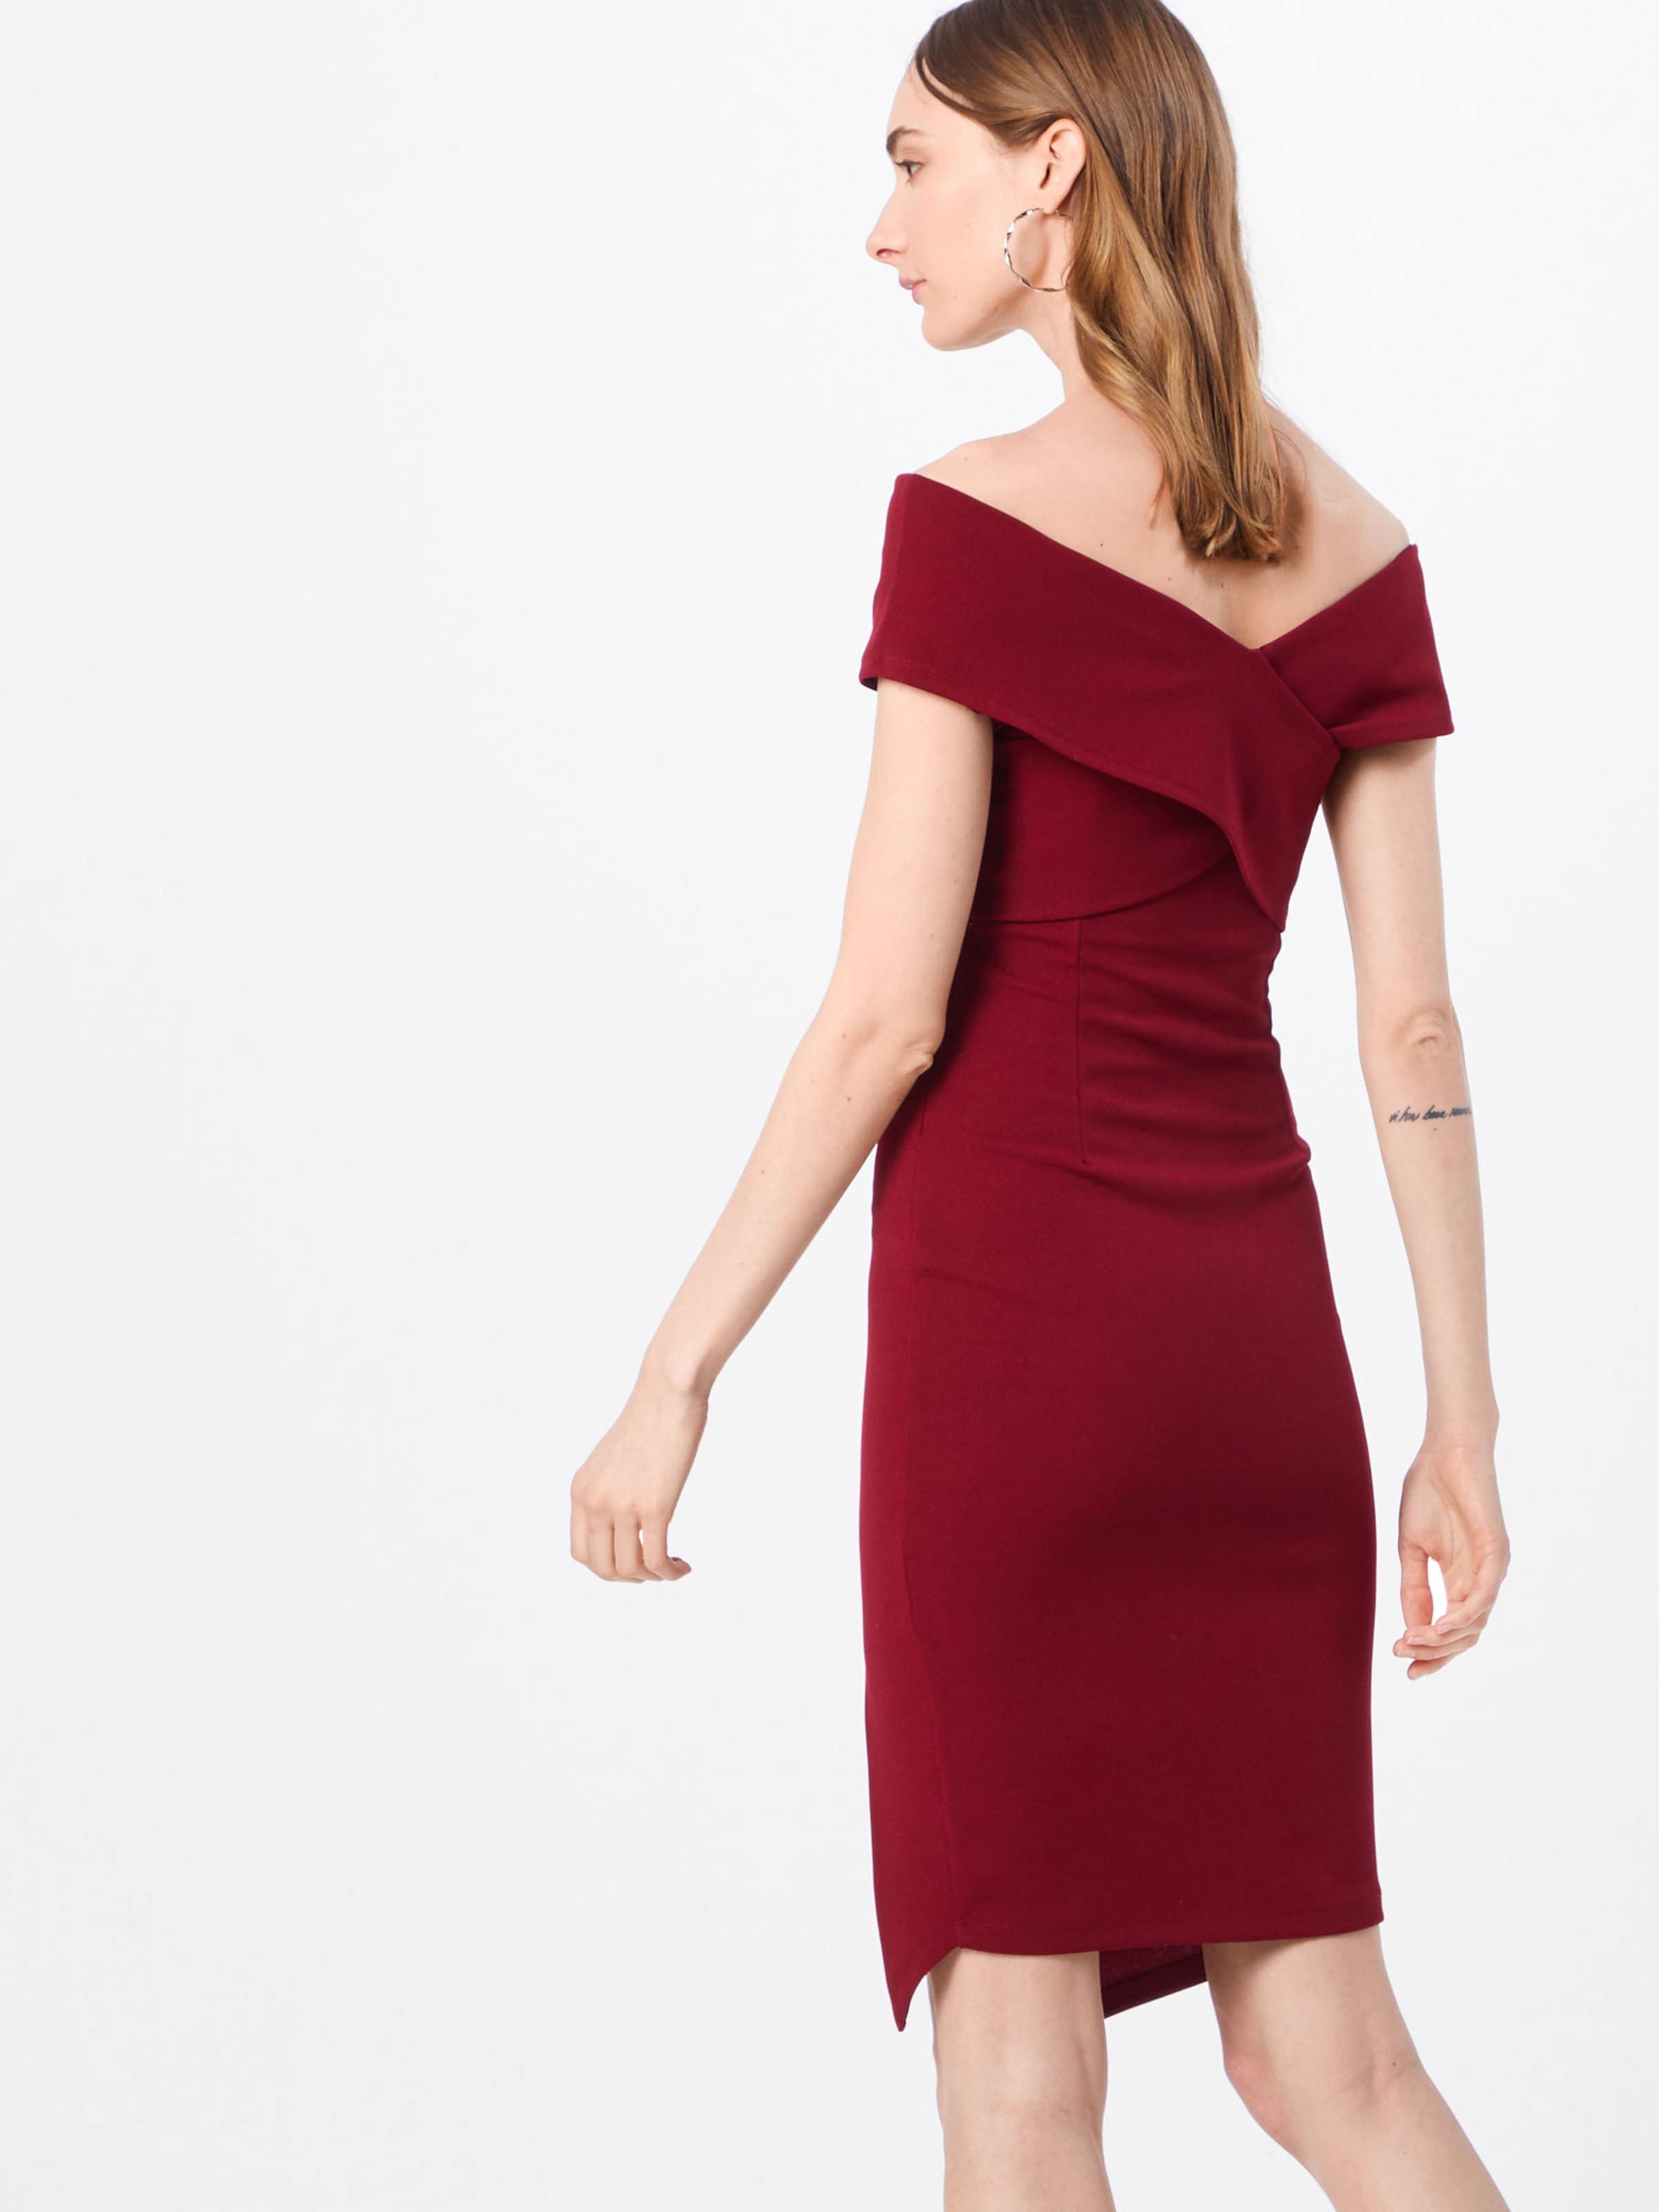 In Kleid Parallel Weinrot In Lines Parallel Weinrot Lines Parallel Kleid srBCohQxtd